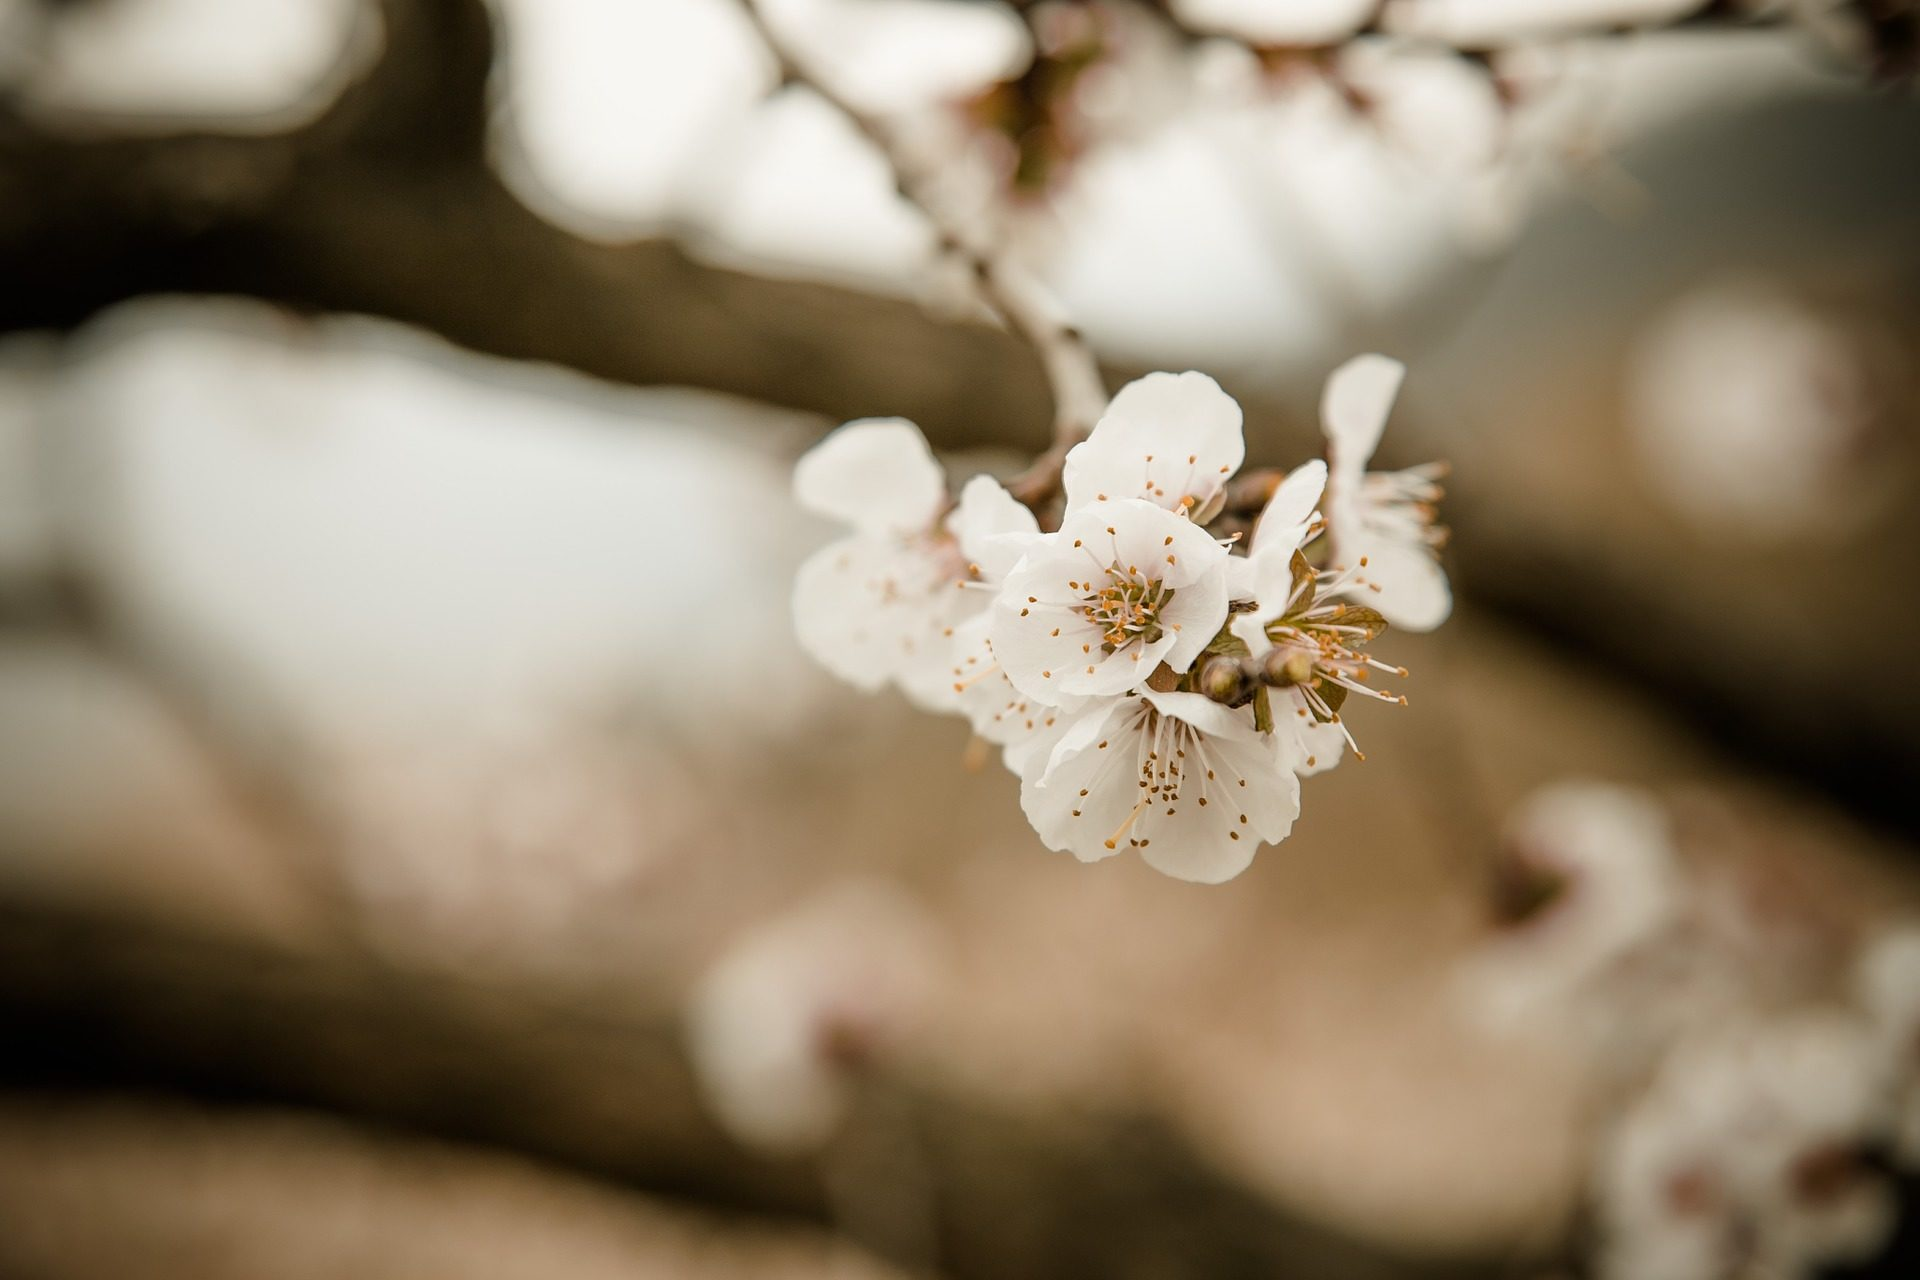 flores, floración, cerezo, pétalos, de cerca - Fondos de Pantalla HD - professor-falken.com